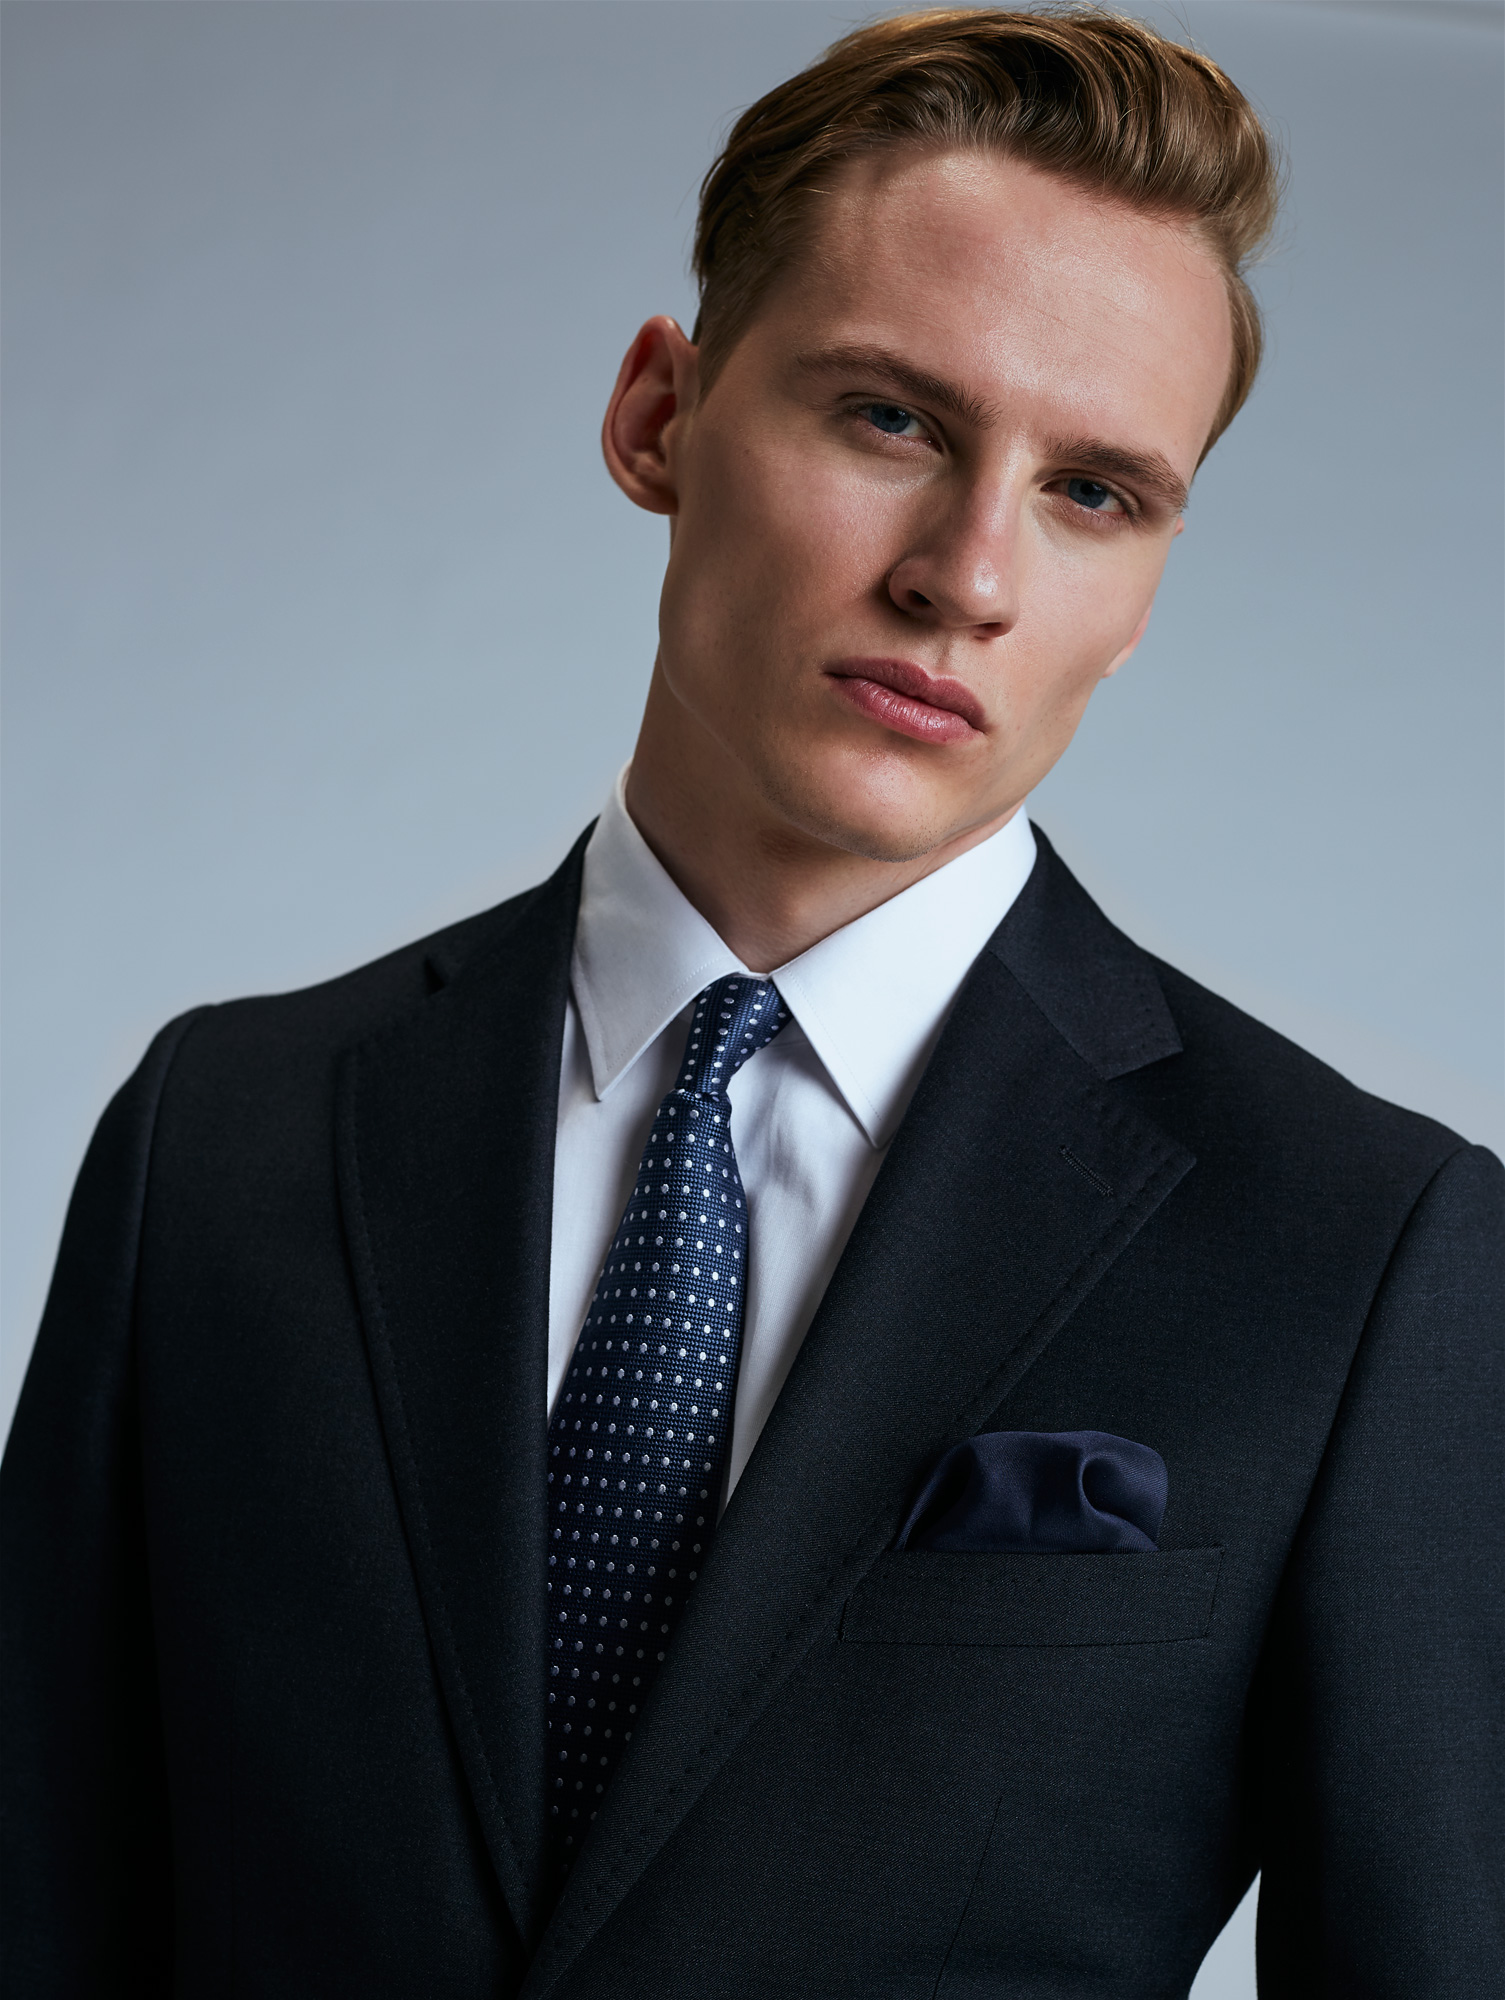 63ecab8dd6e52 Idealny garnitur ślubny - różne sylwetki, różne style - Wedding.pl